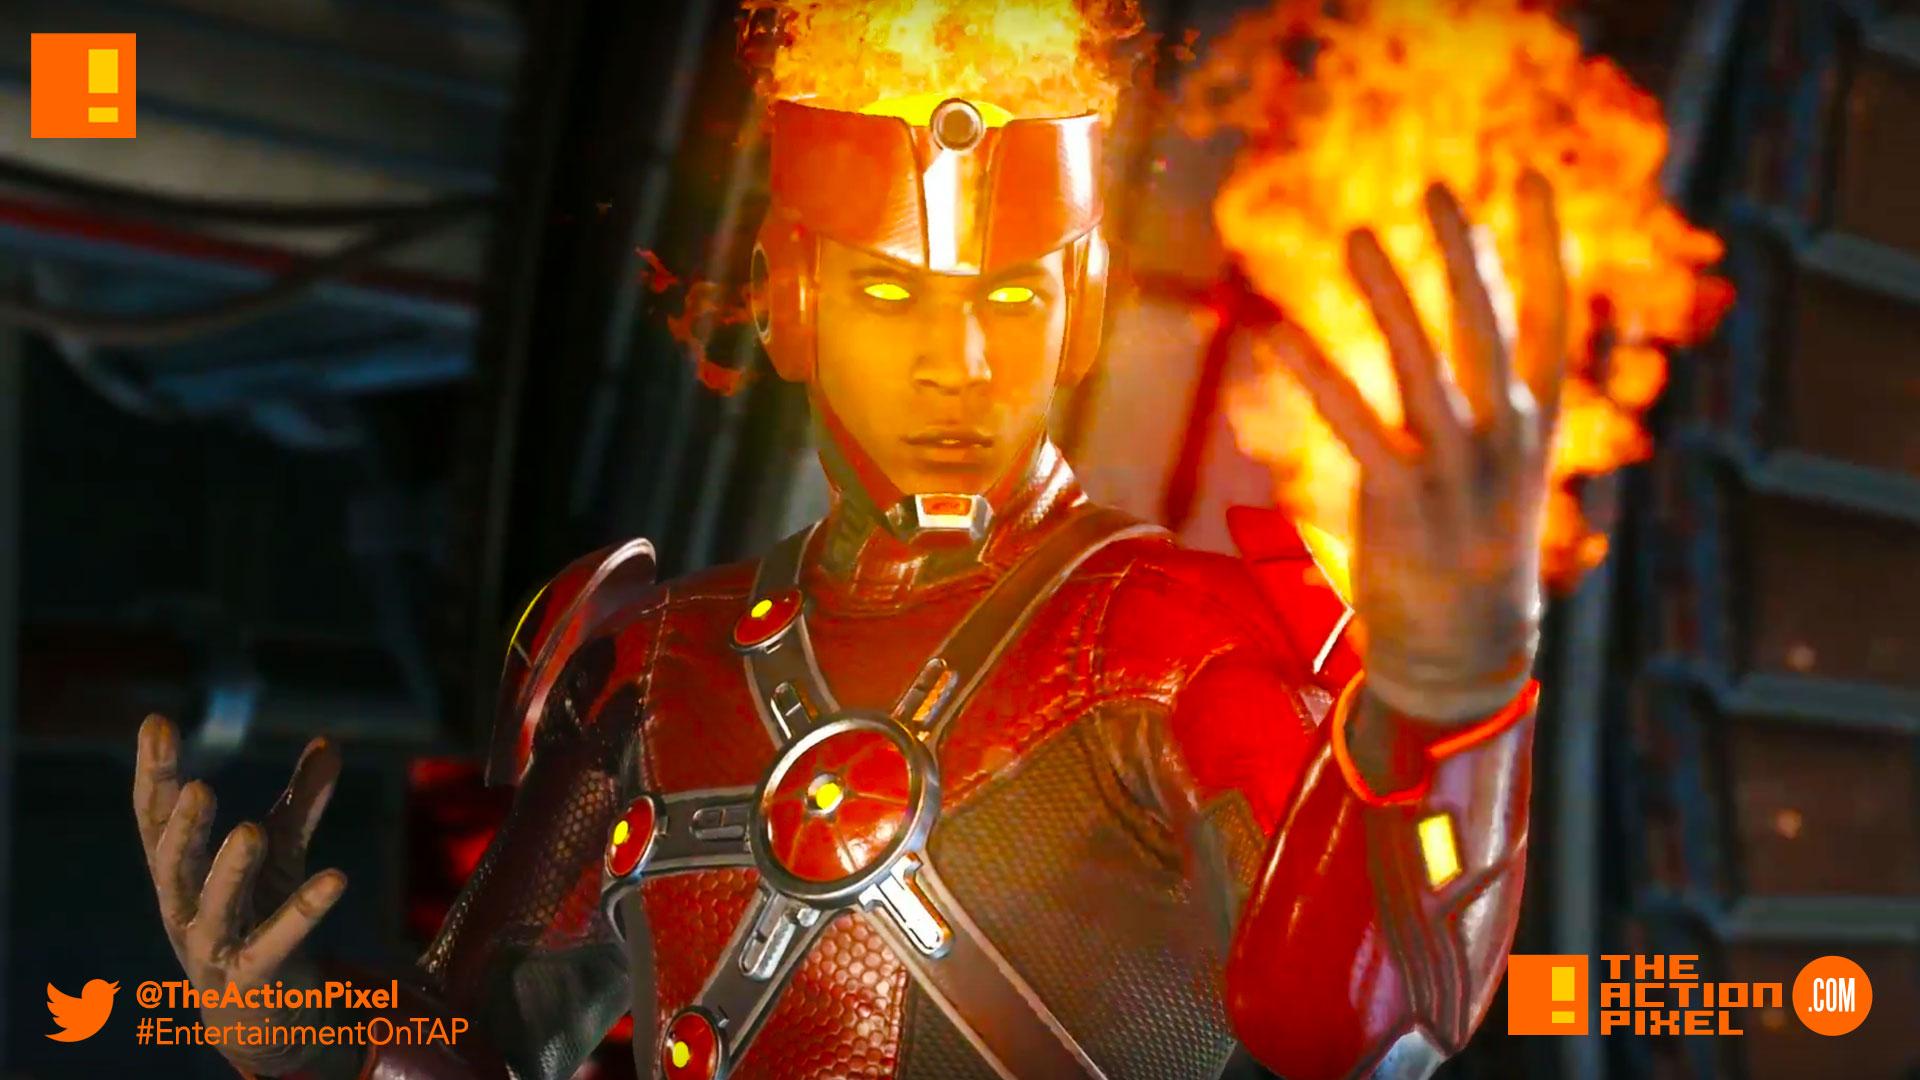 firestorm, injustice 2, wb games, netherrealm studios, the action pixel, dc comics, warner bros. entertainment , the action pixel, superman, dc comics, batman